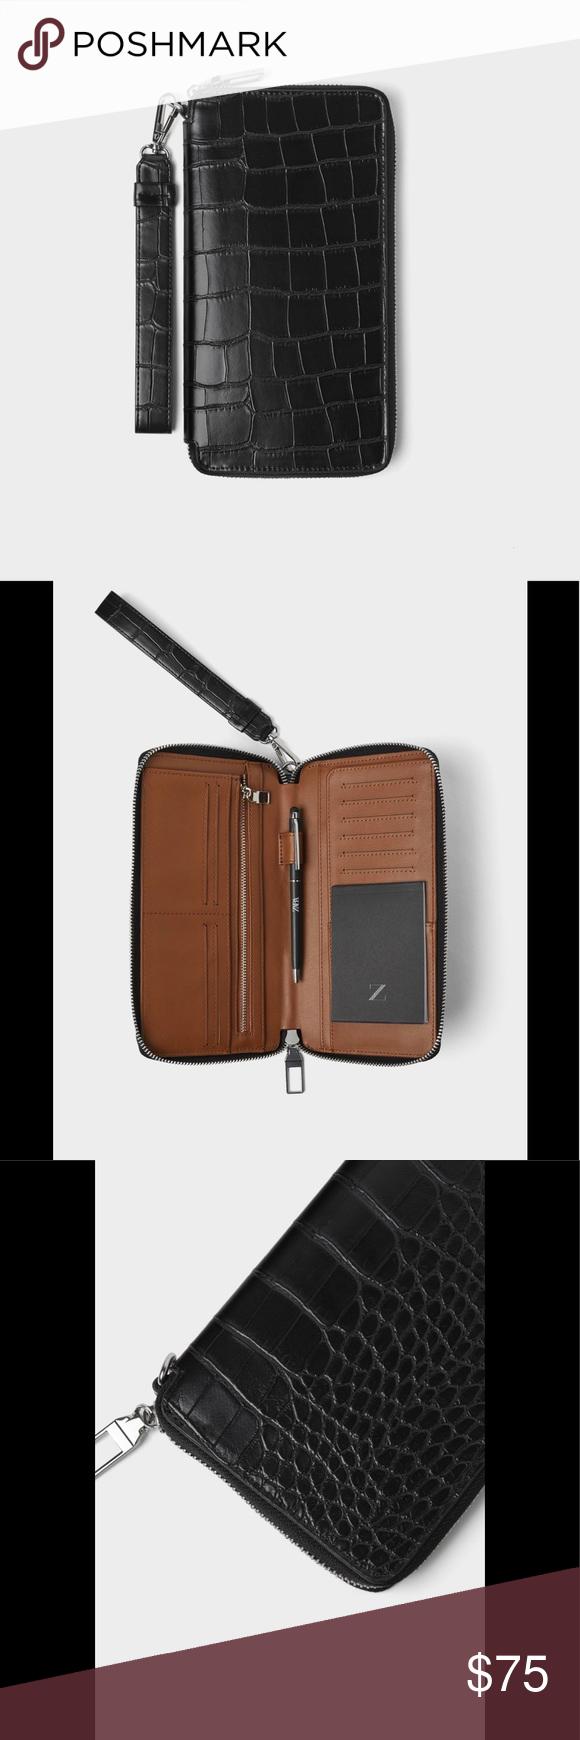 bce1e420 Zara XL black croc embossed wallet SPRING/SUMMER '19 Collection ...